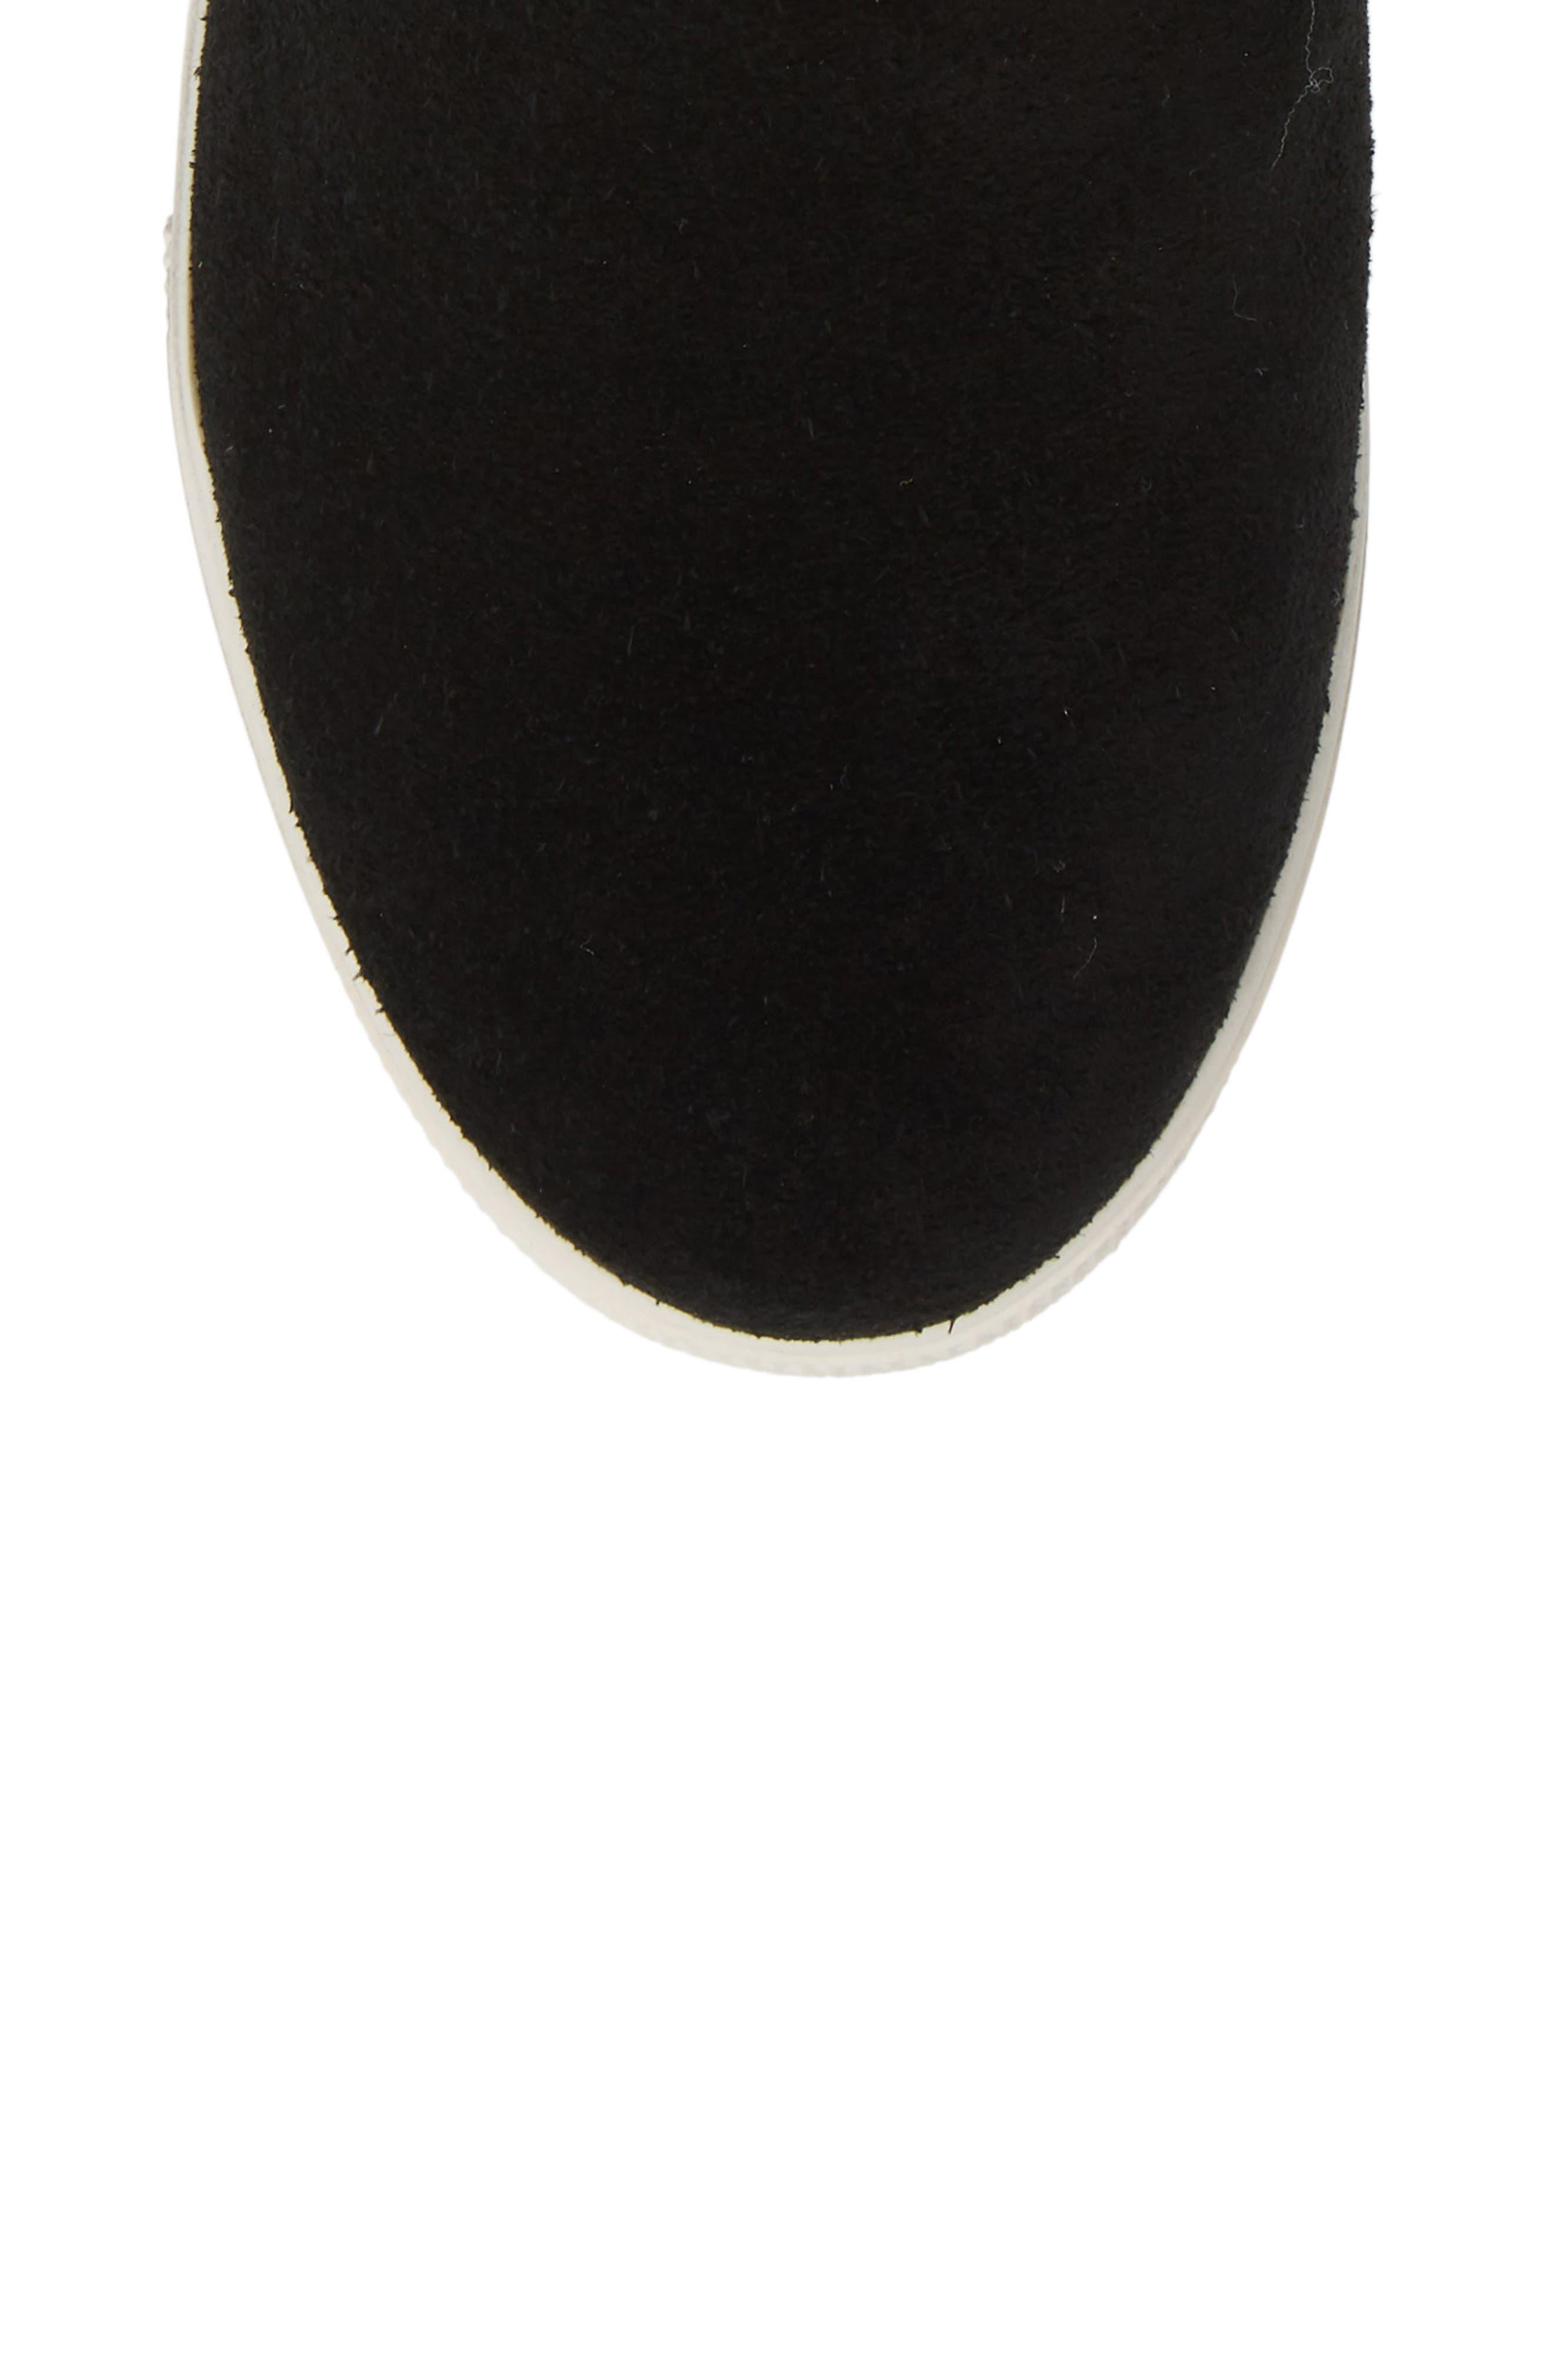 STEVE MADDEN,                             Faux Fur Lined Sneaker,                             Alternate thumbnail 5, color,                             006